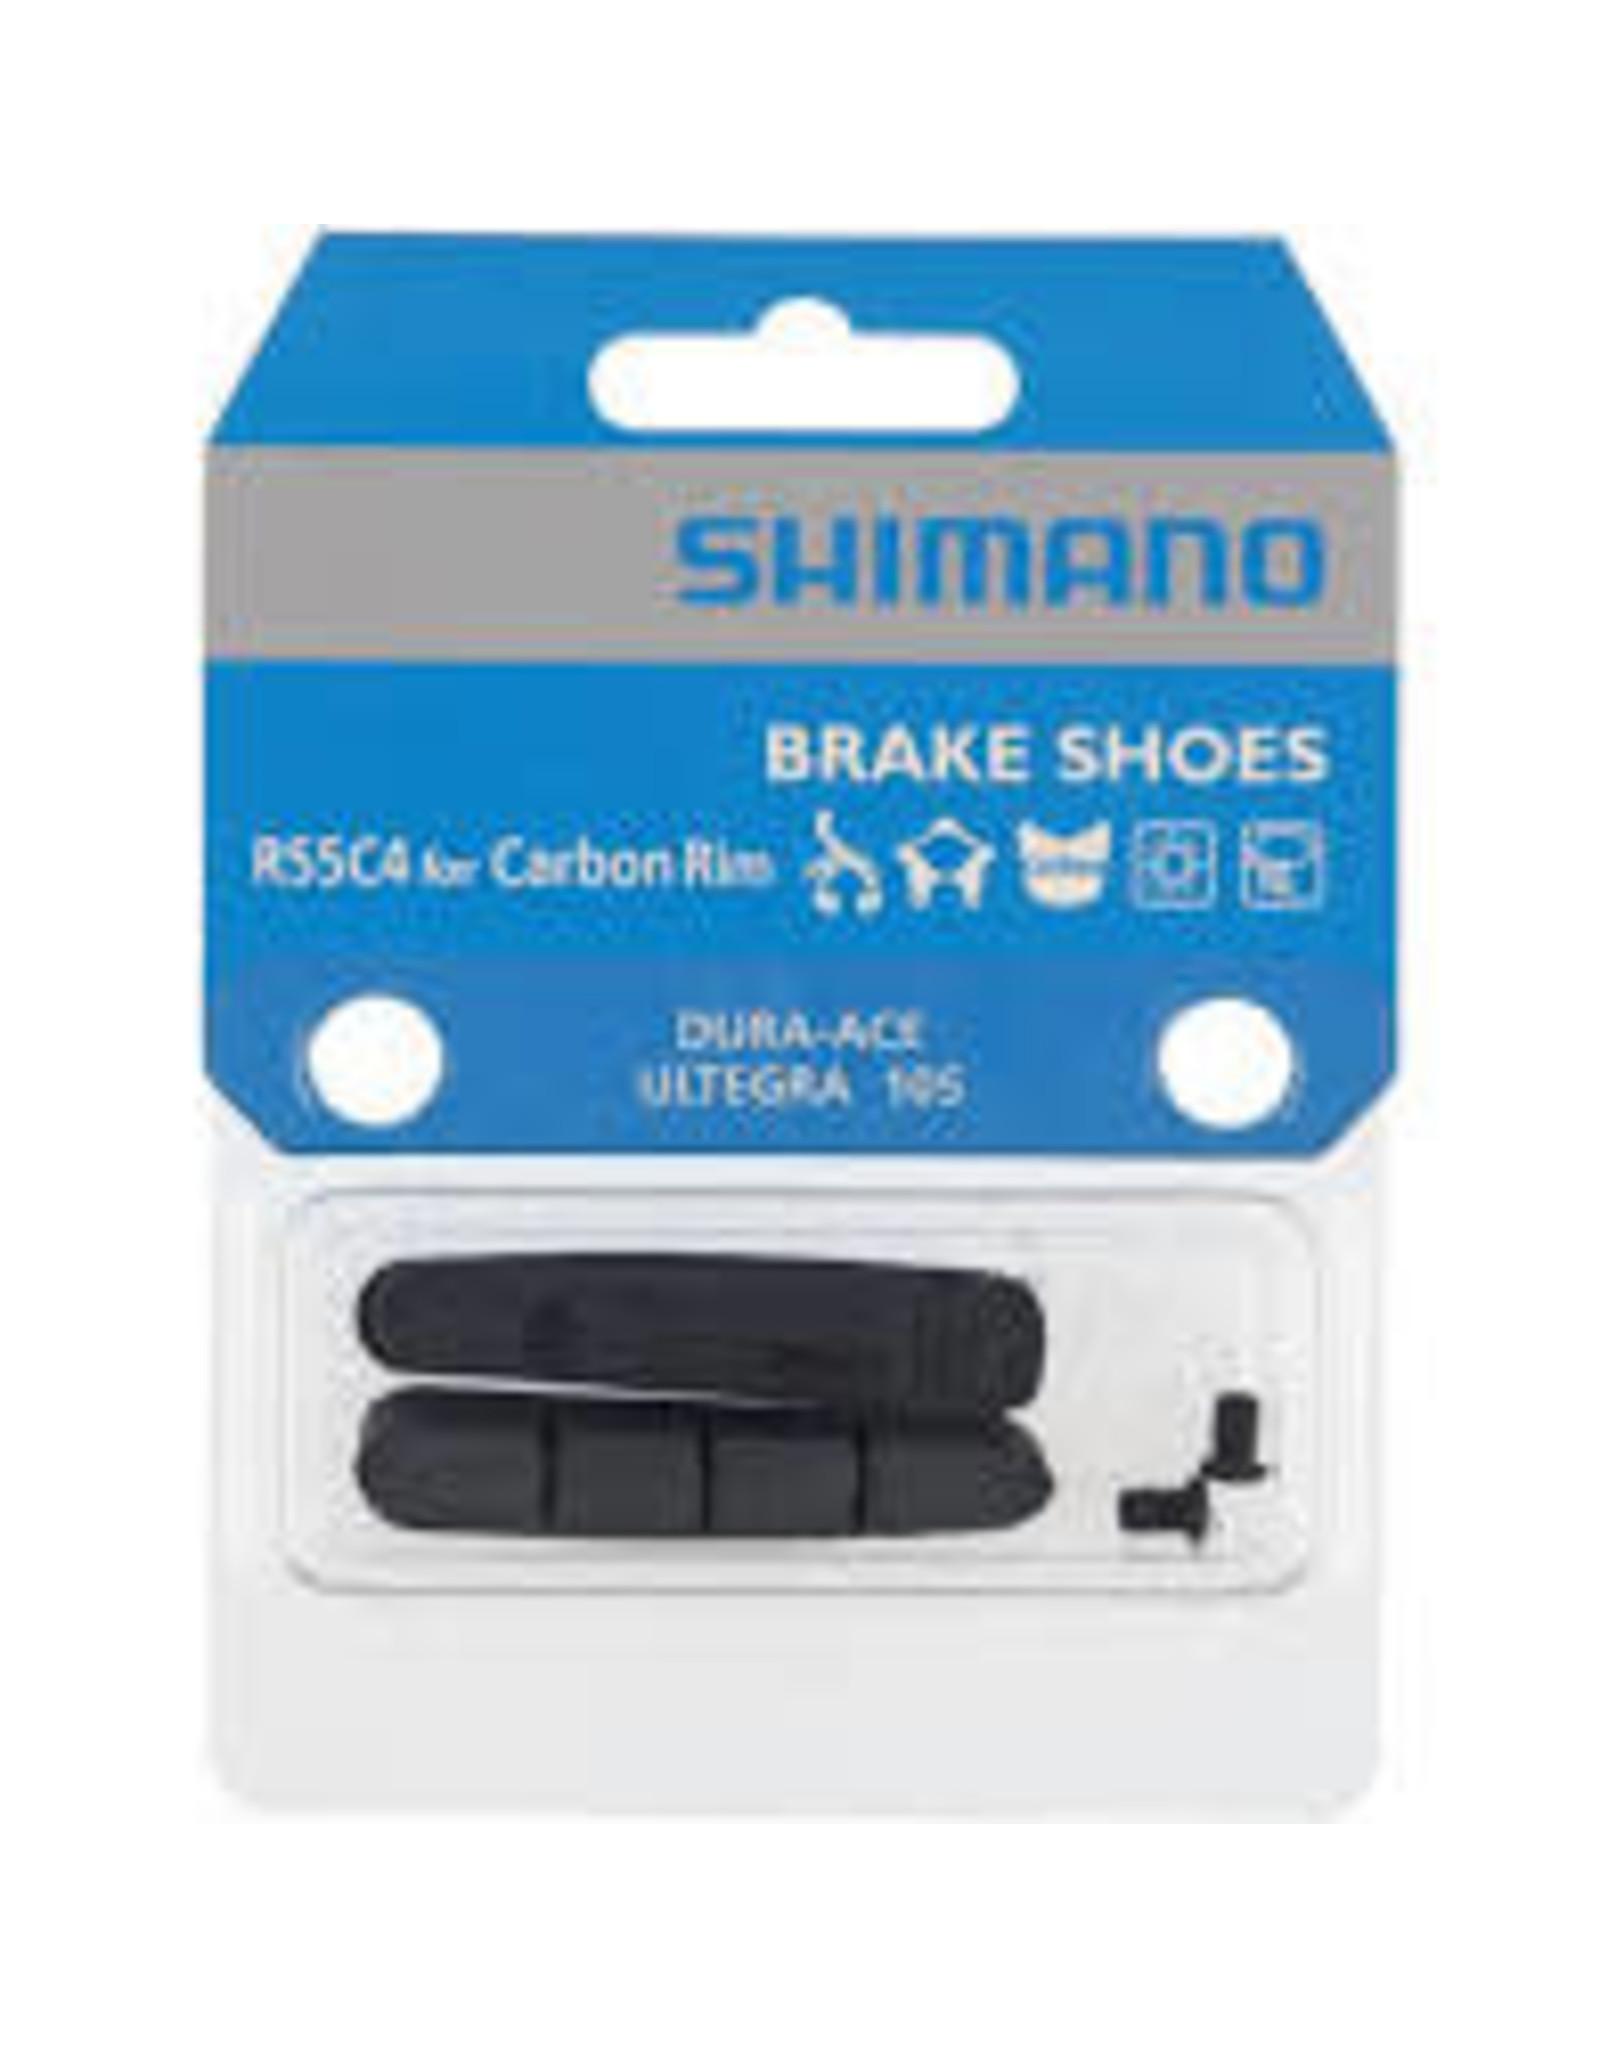 Shimano Brake Pad Shi R55C4-A Pads for Carbon Rims, Pair